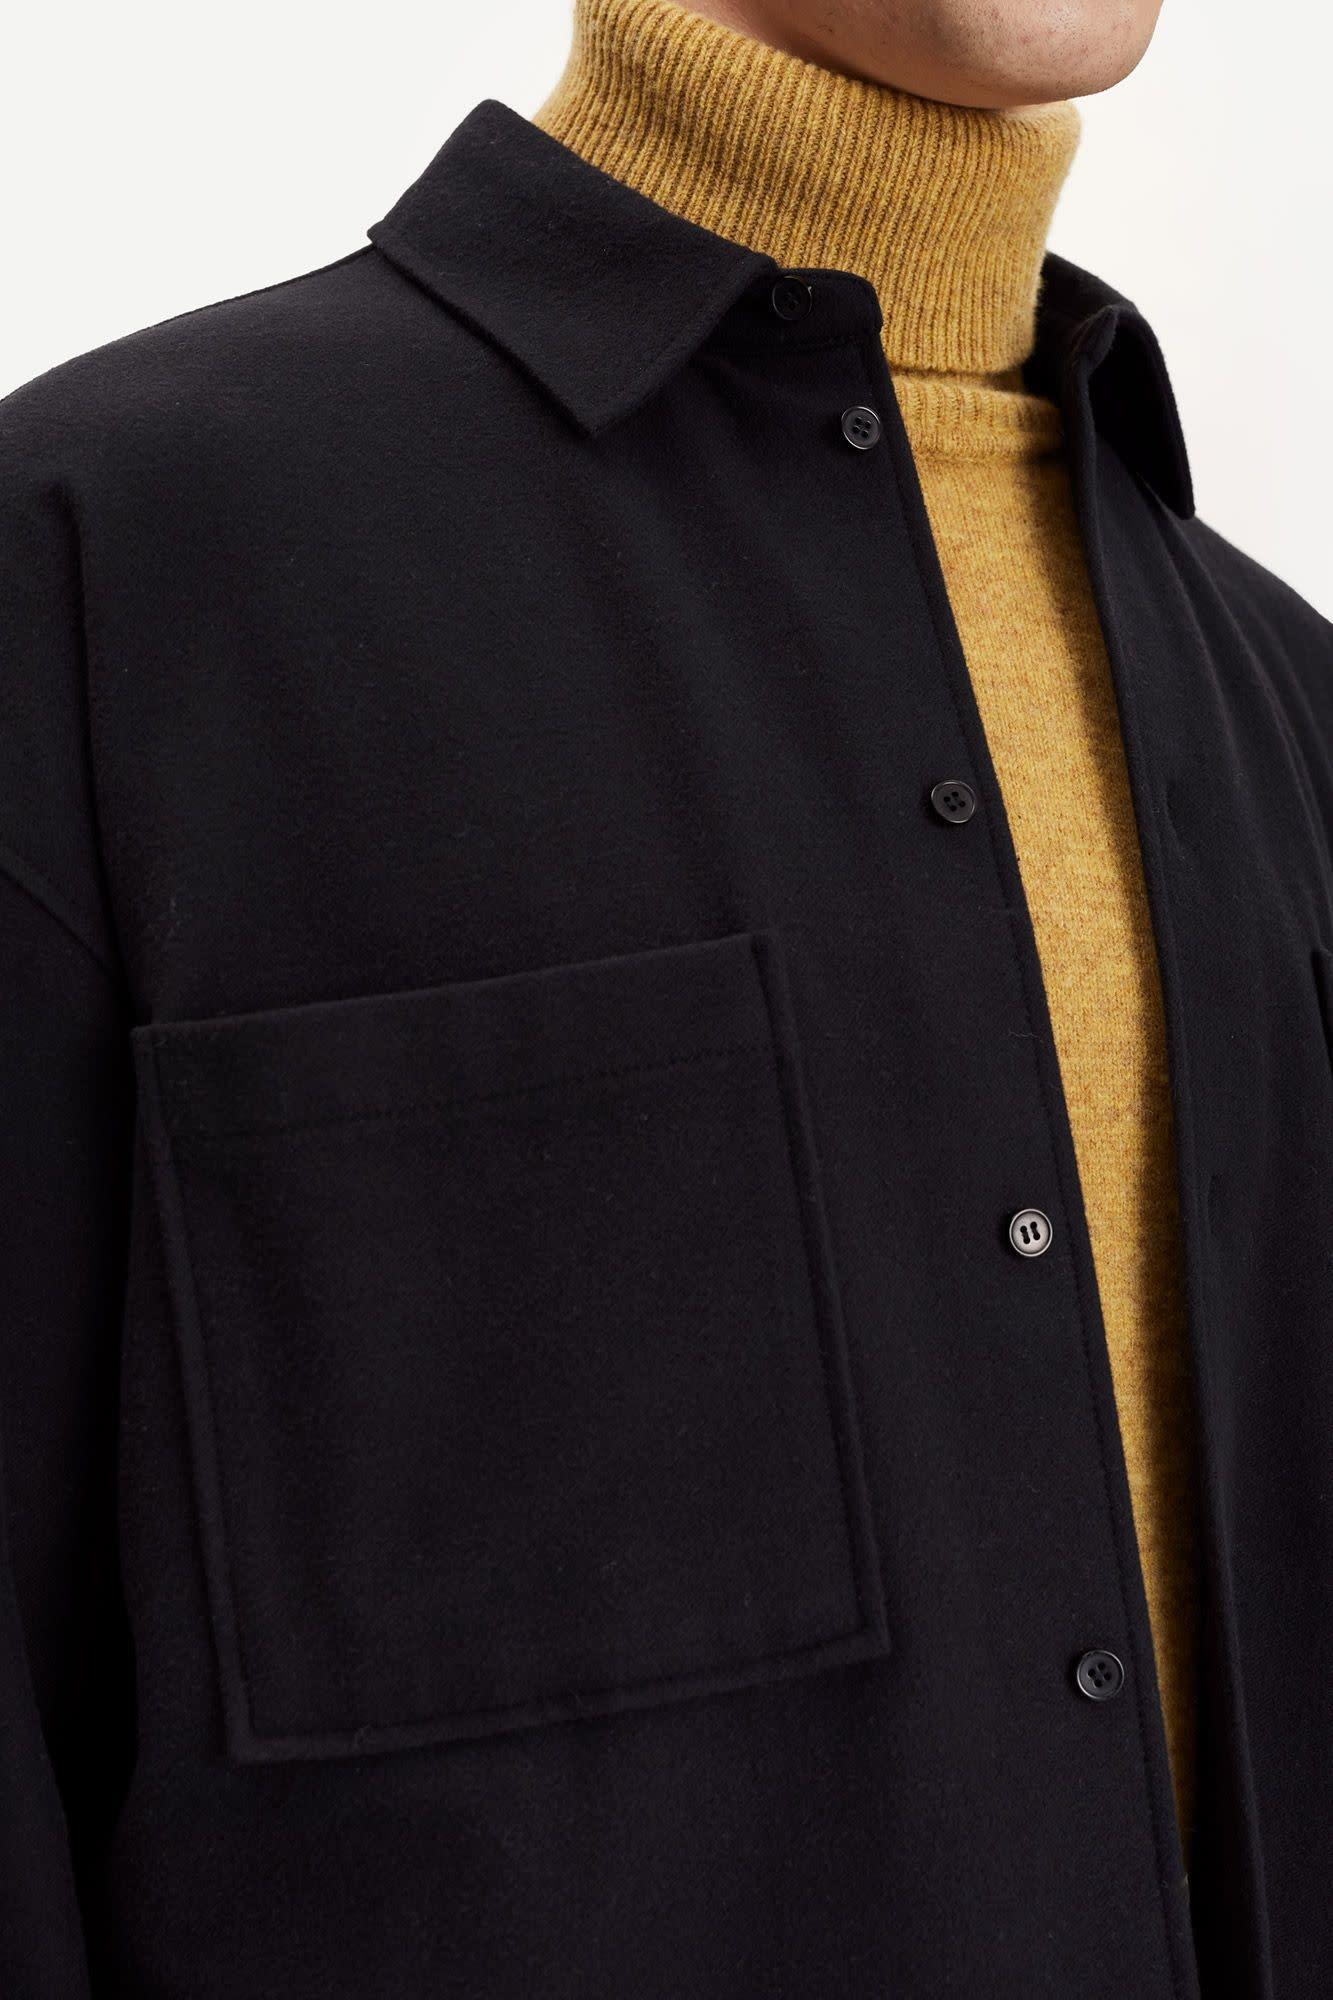 Poule Heavy Overshirt Black-2